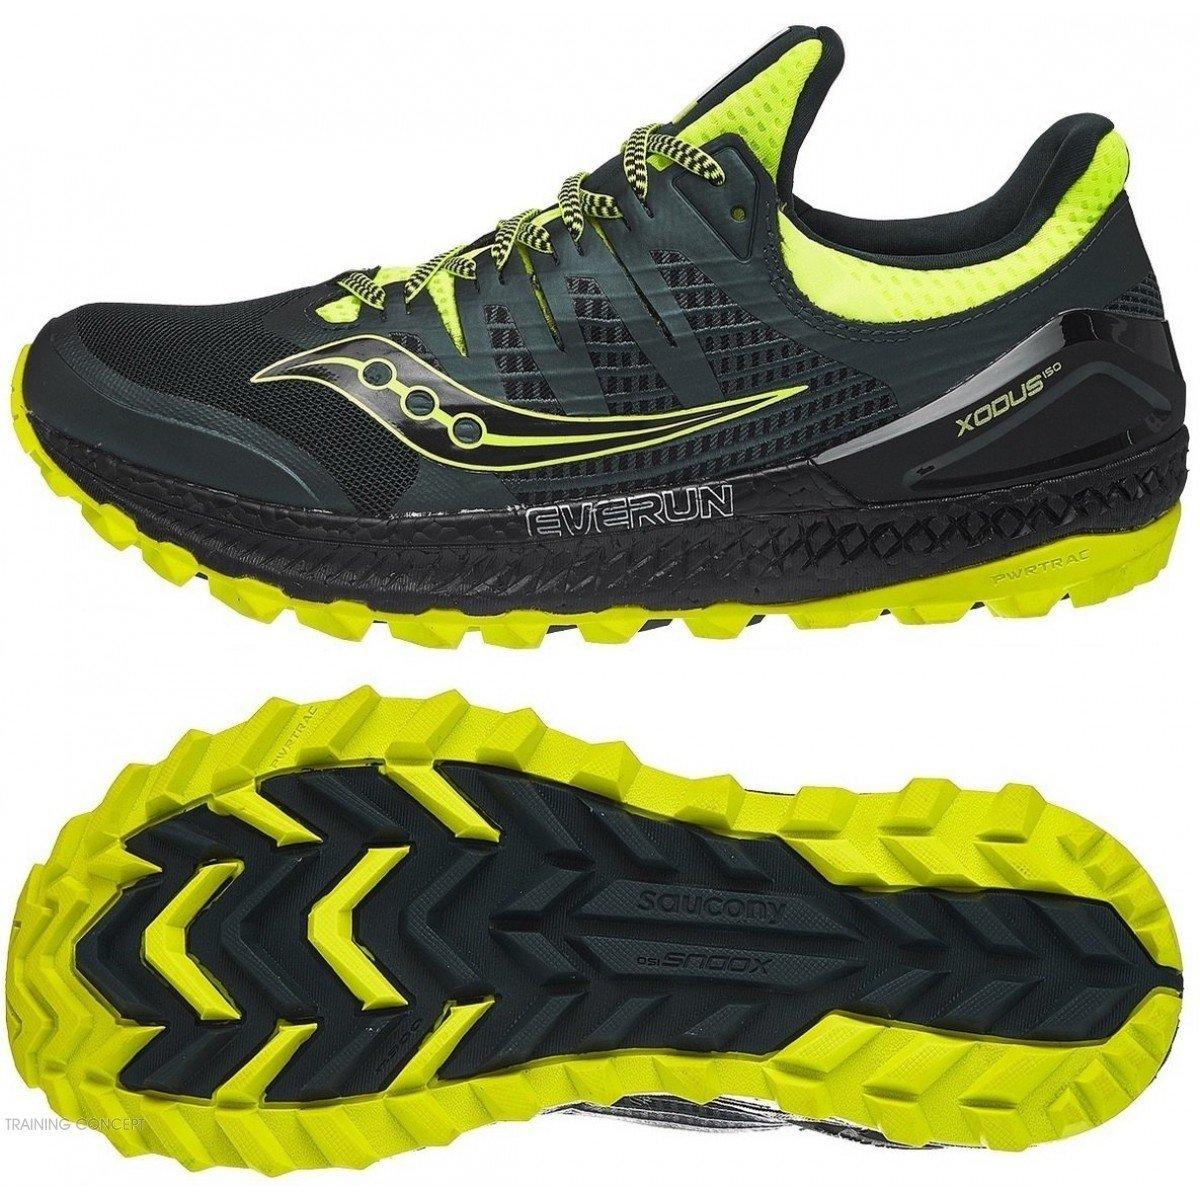 Chaussures de Running Femme Saucony Xodus ISO 3 Gris Noir